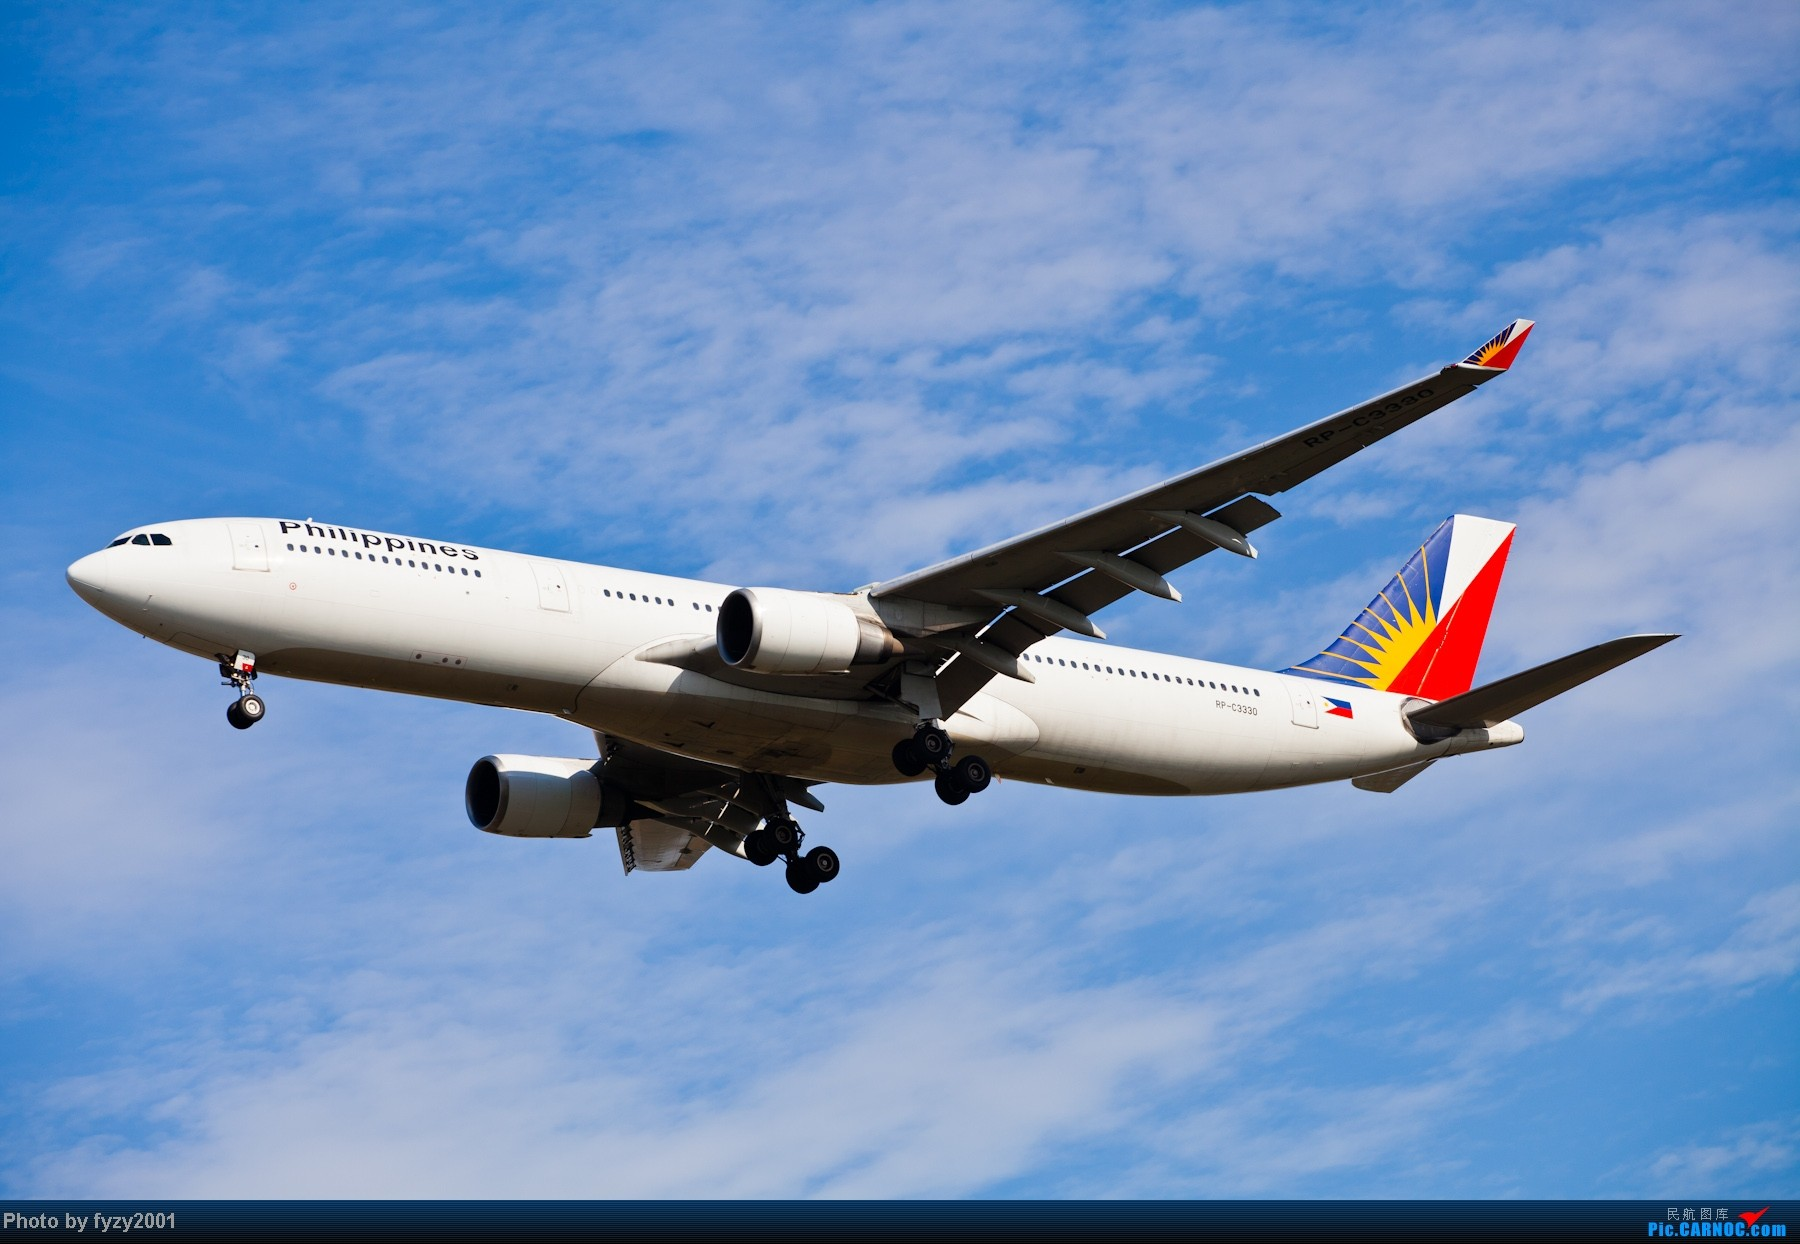 Re:[原创][无锡西站]长假PVG蹲守~~~~只发大图,多图杀猫~~~~ AIRBUS A330-300 RP-C3330 中国上海浦东机场